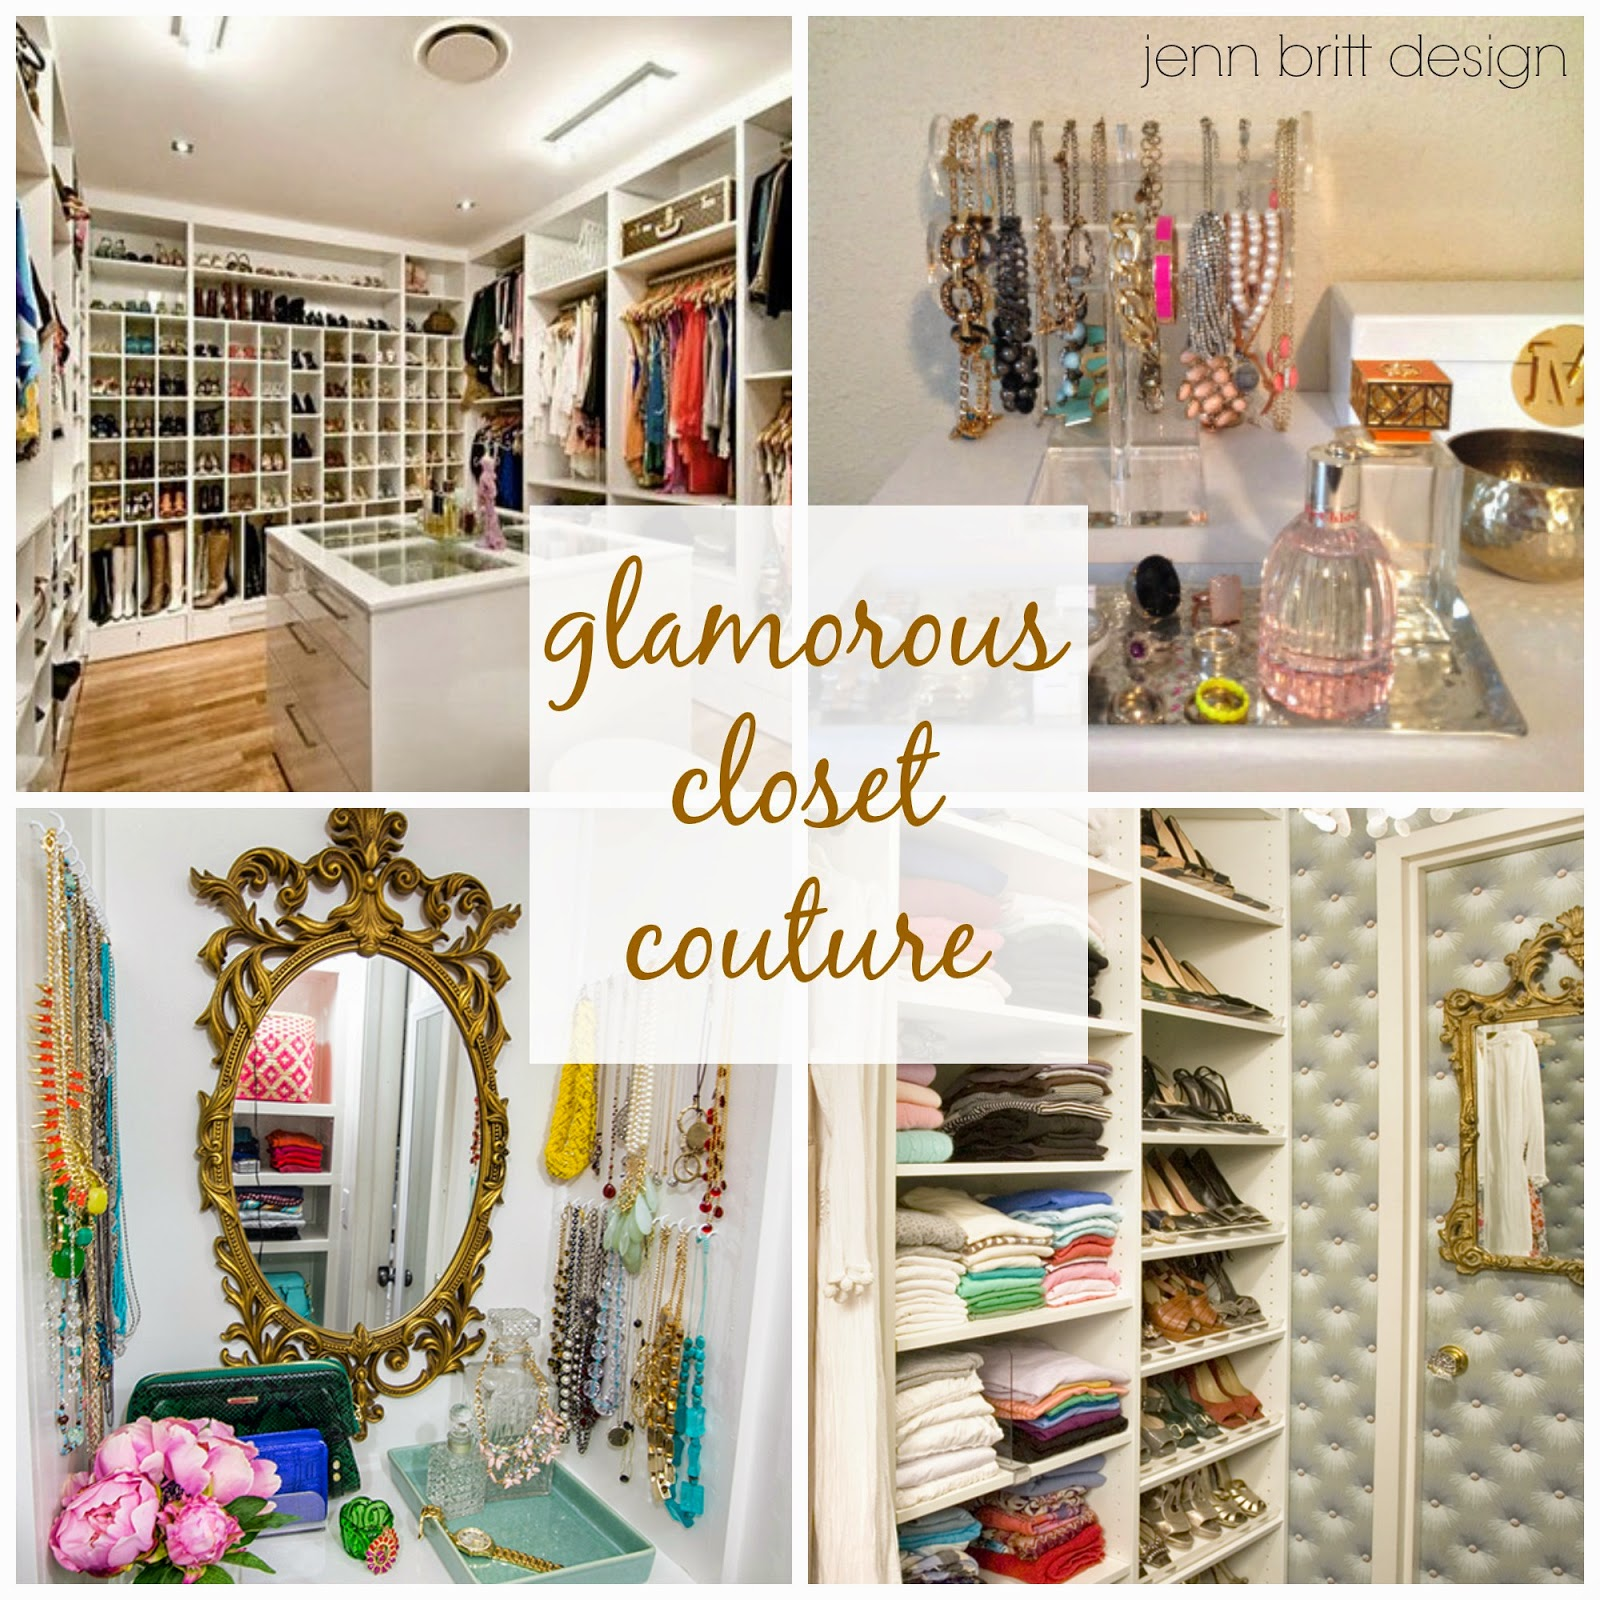 Ordinaire Glamorous Closet Couture